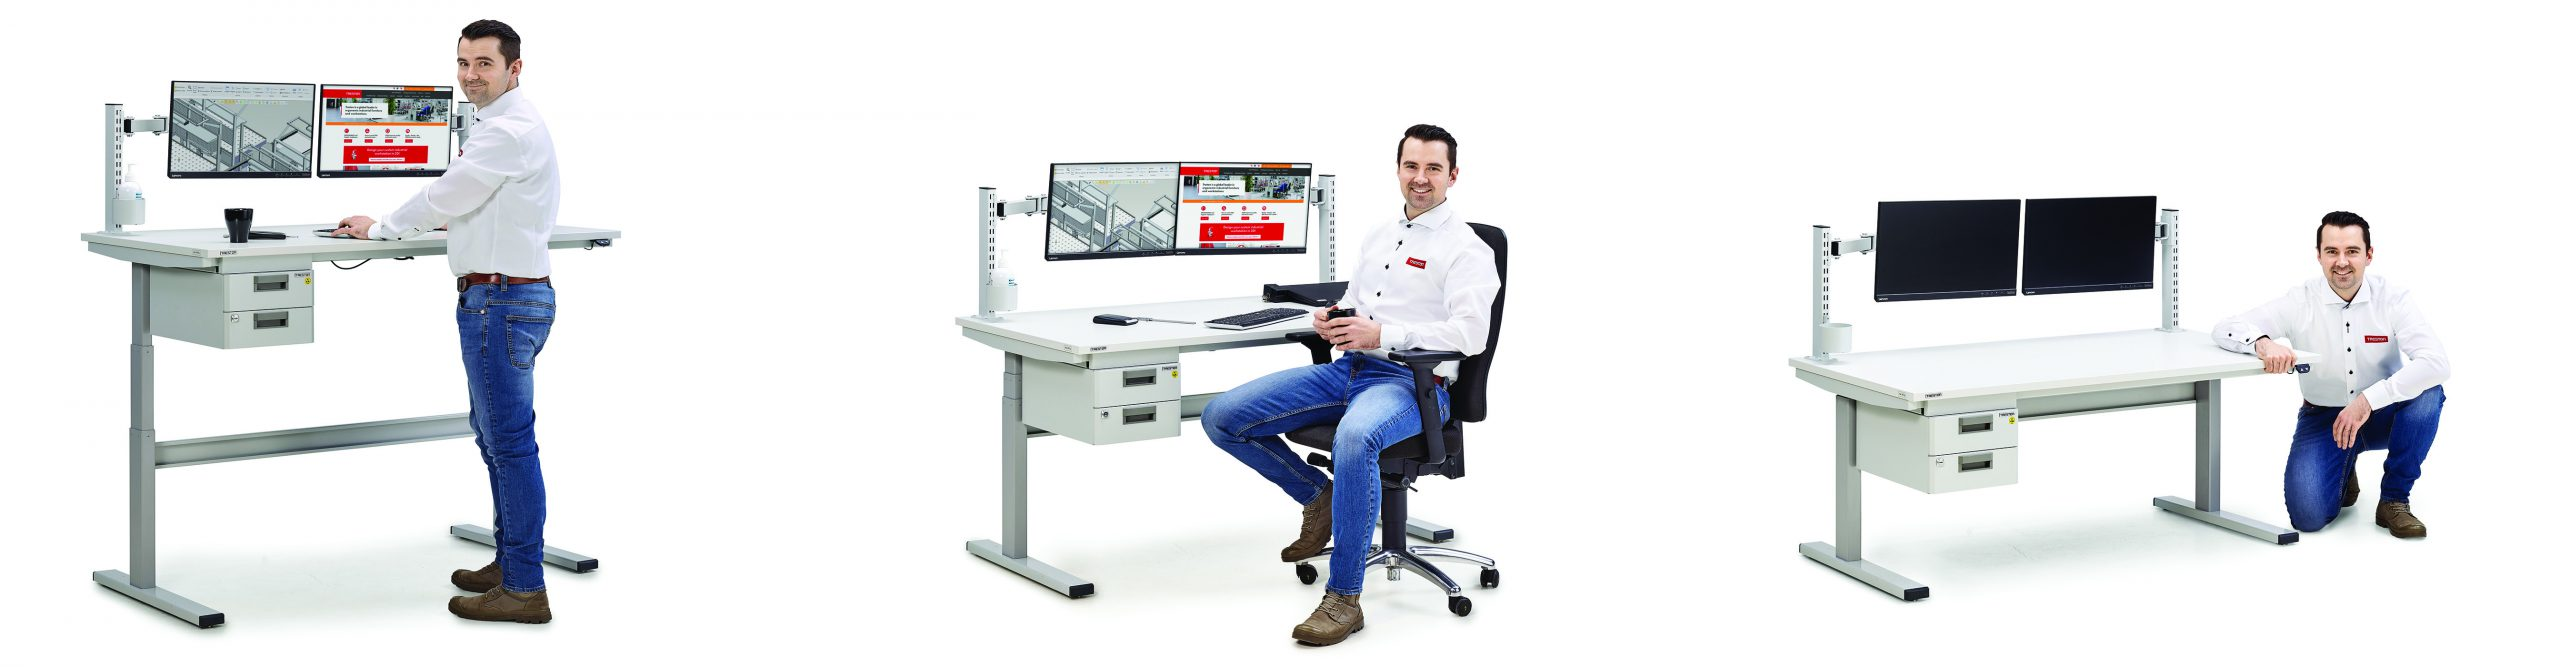 Sovella Nederland Treston concept werktafel Zit sta werkplek voor industrie en logistiek